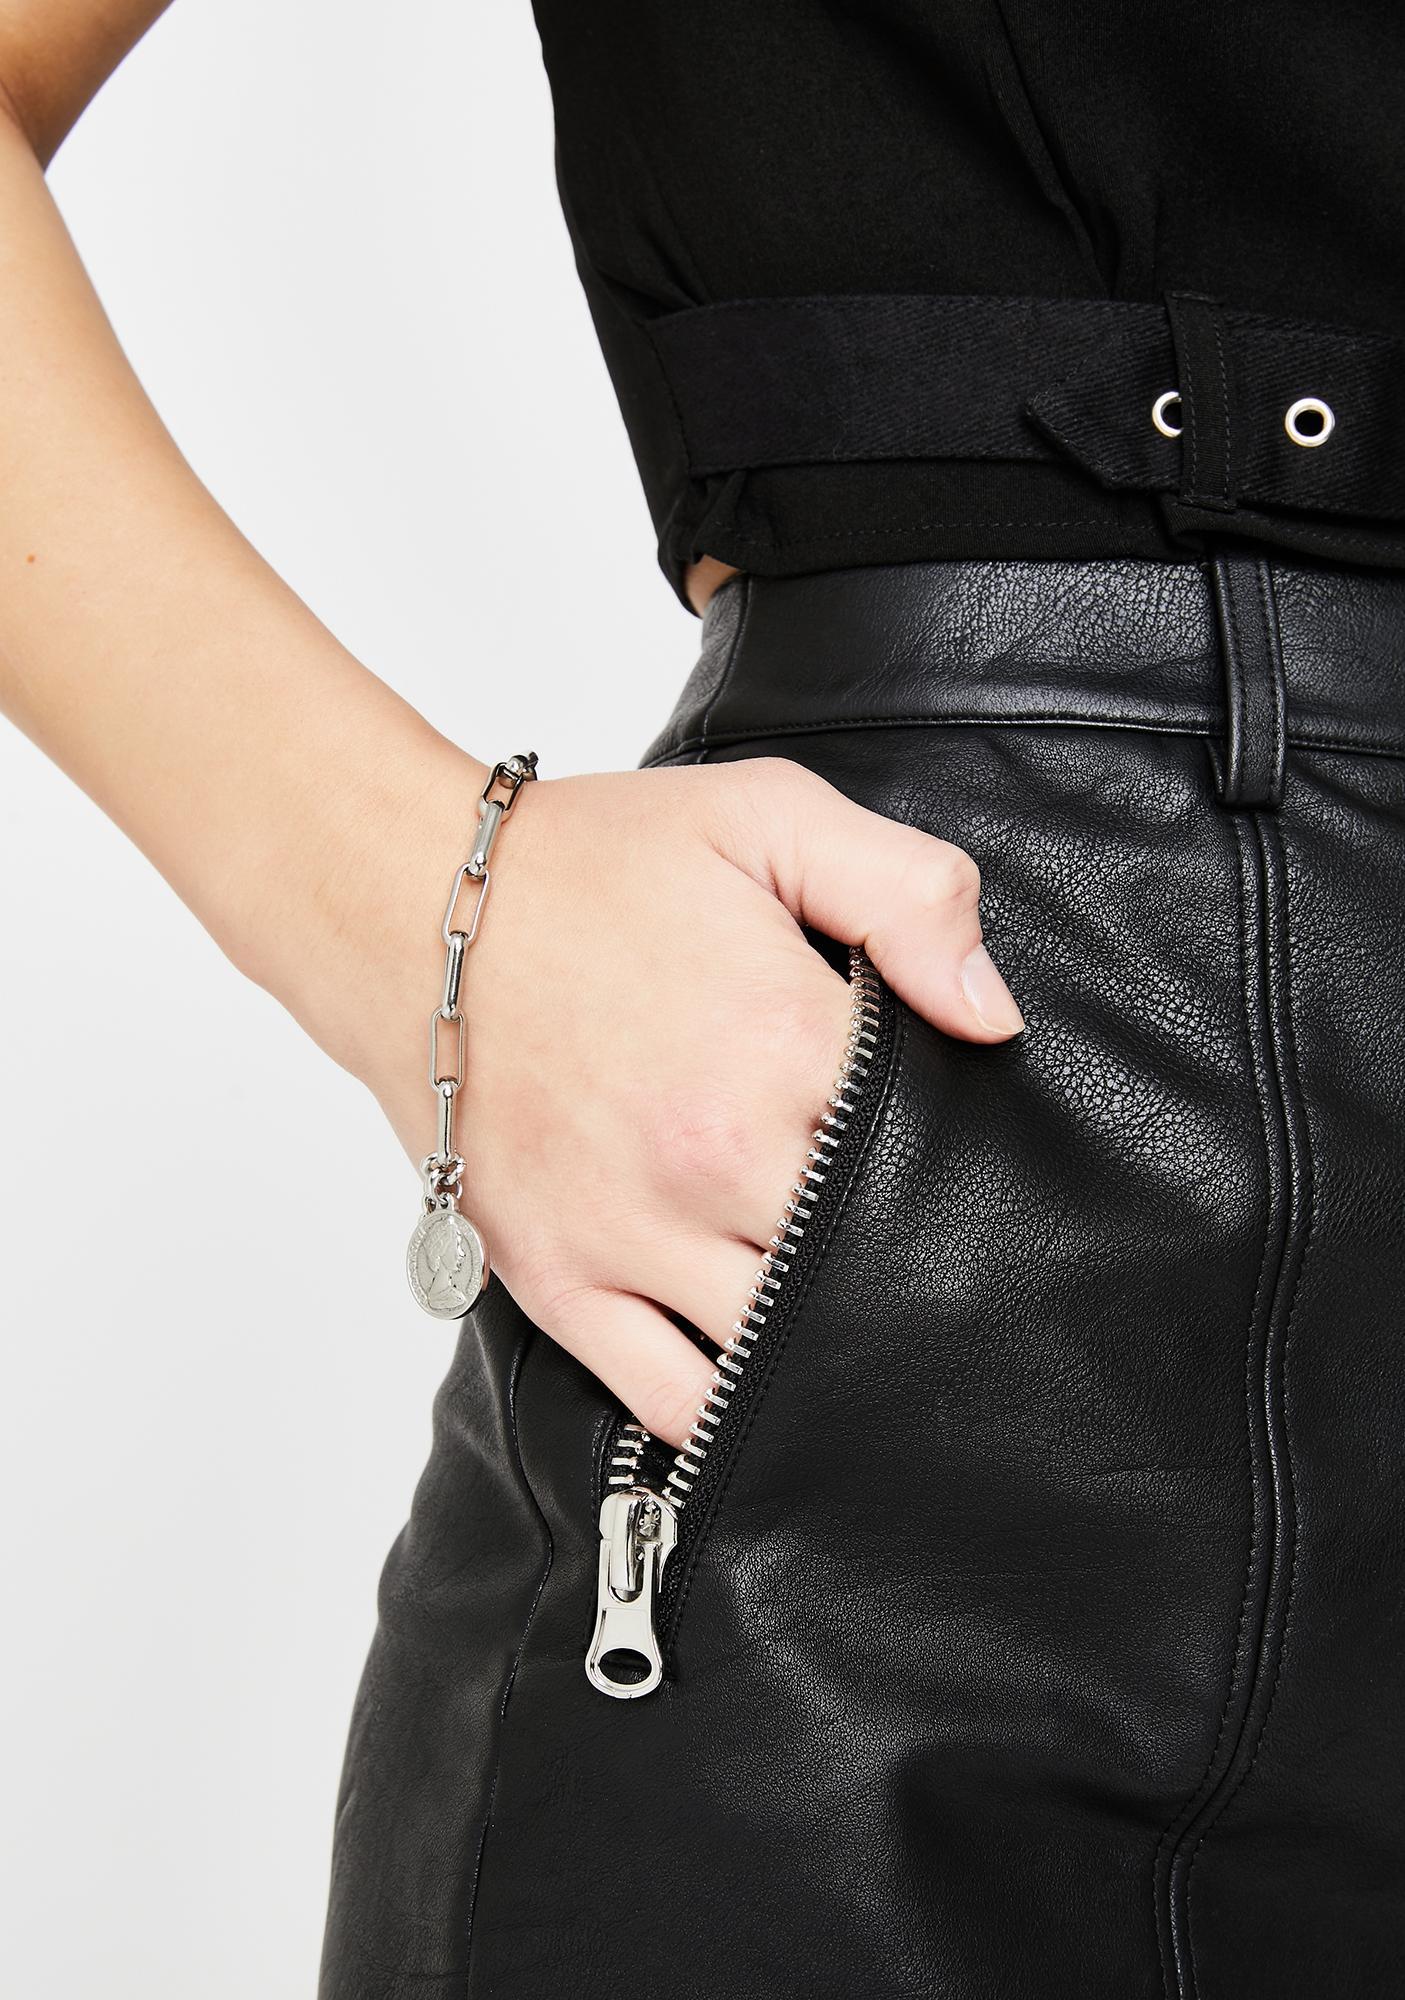 Get That Coin Chain Bracelet